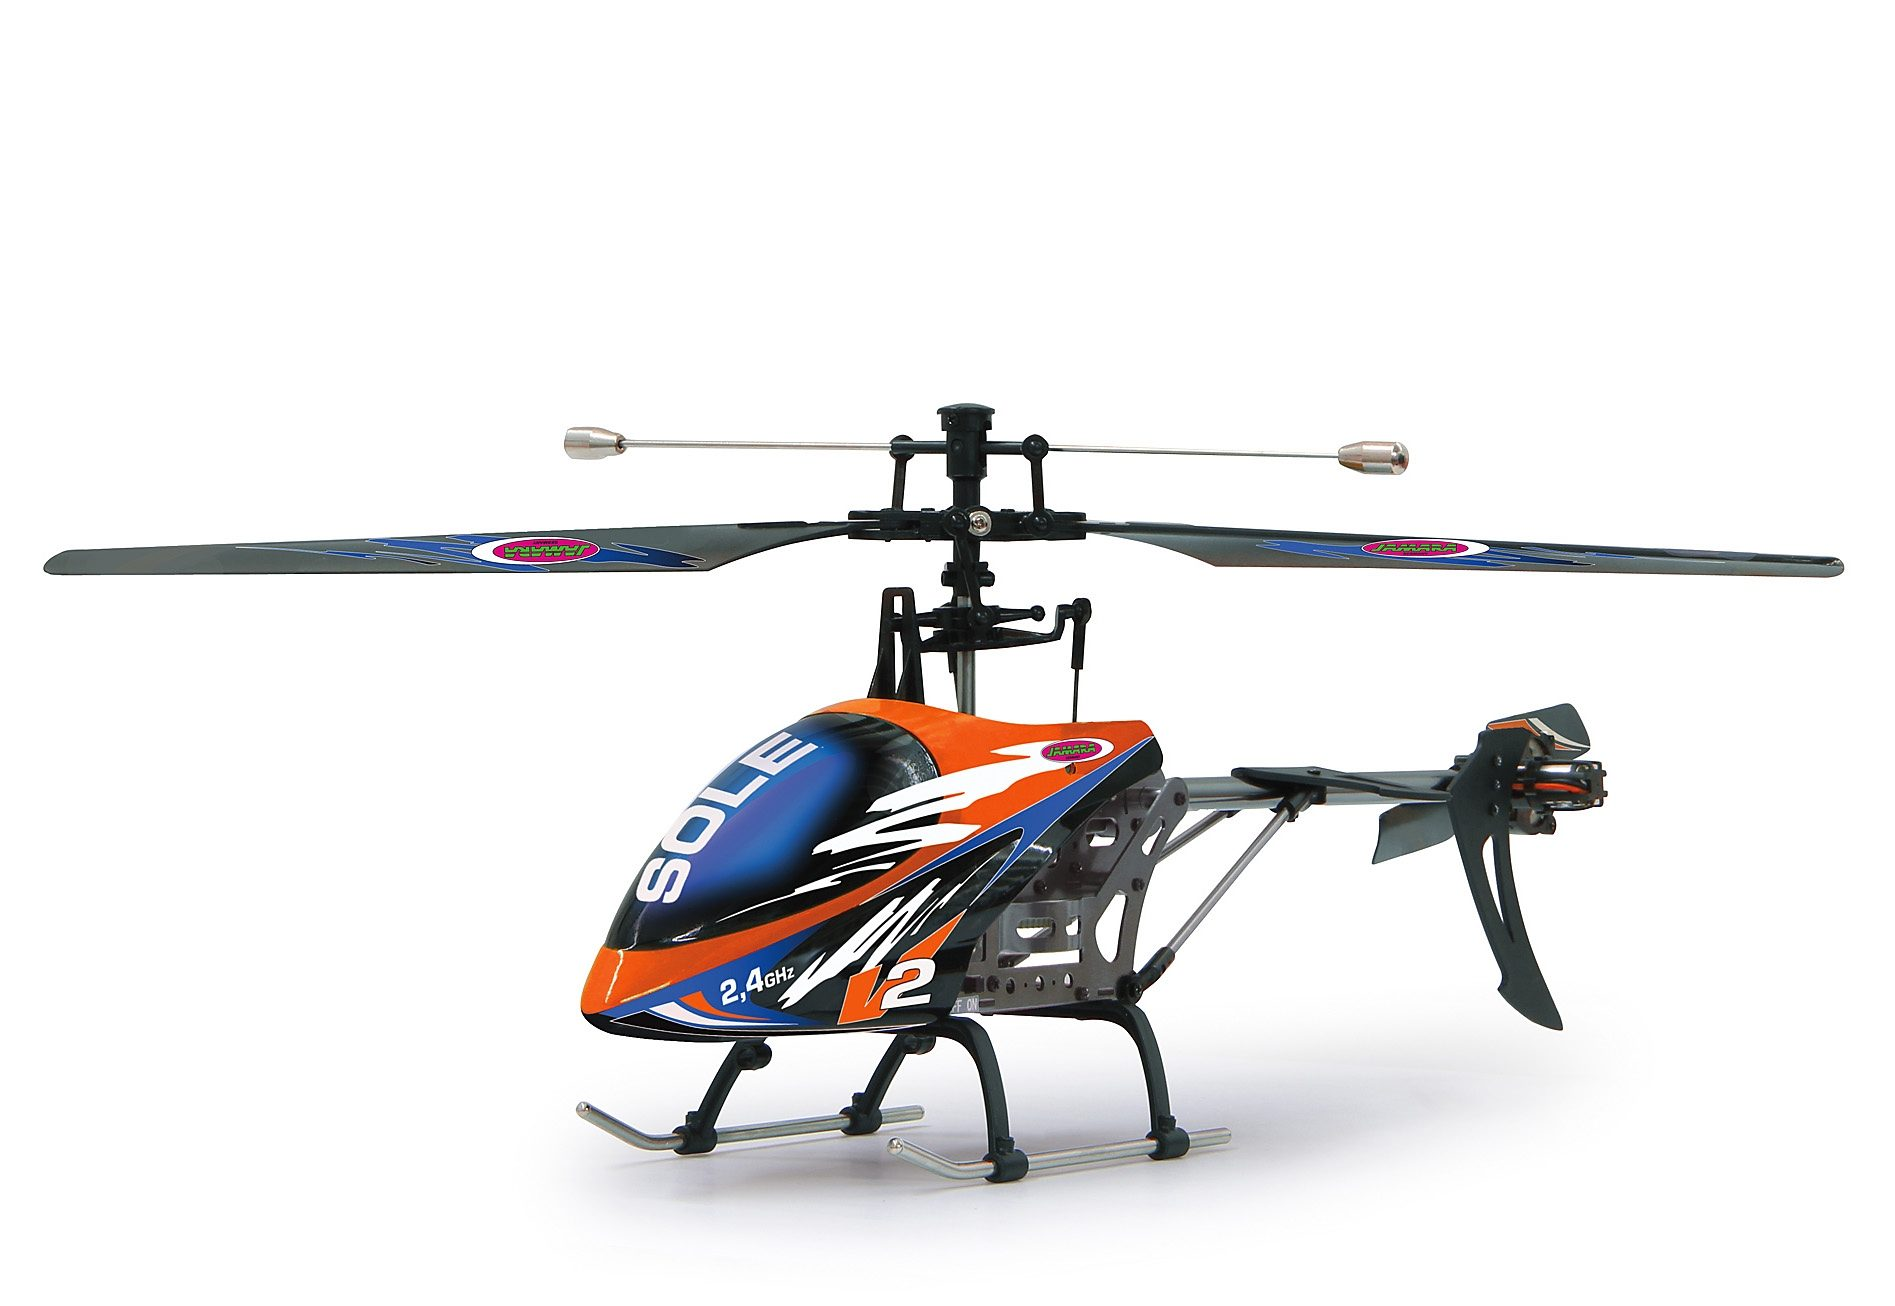 JAMARA RC Helikopter, »SOLE V2 Pro 2,4 GHz«